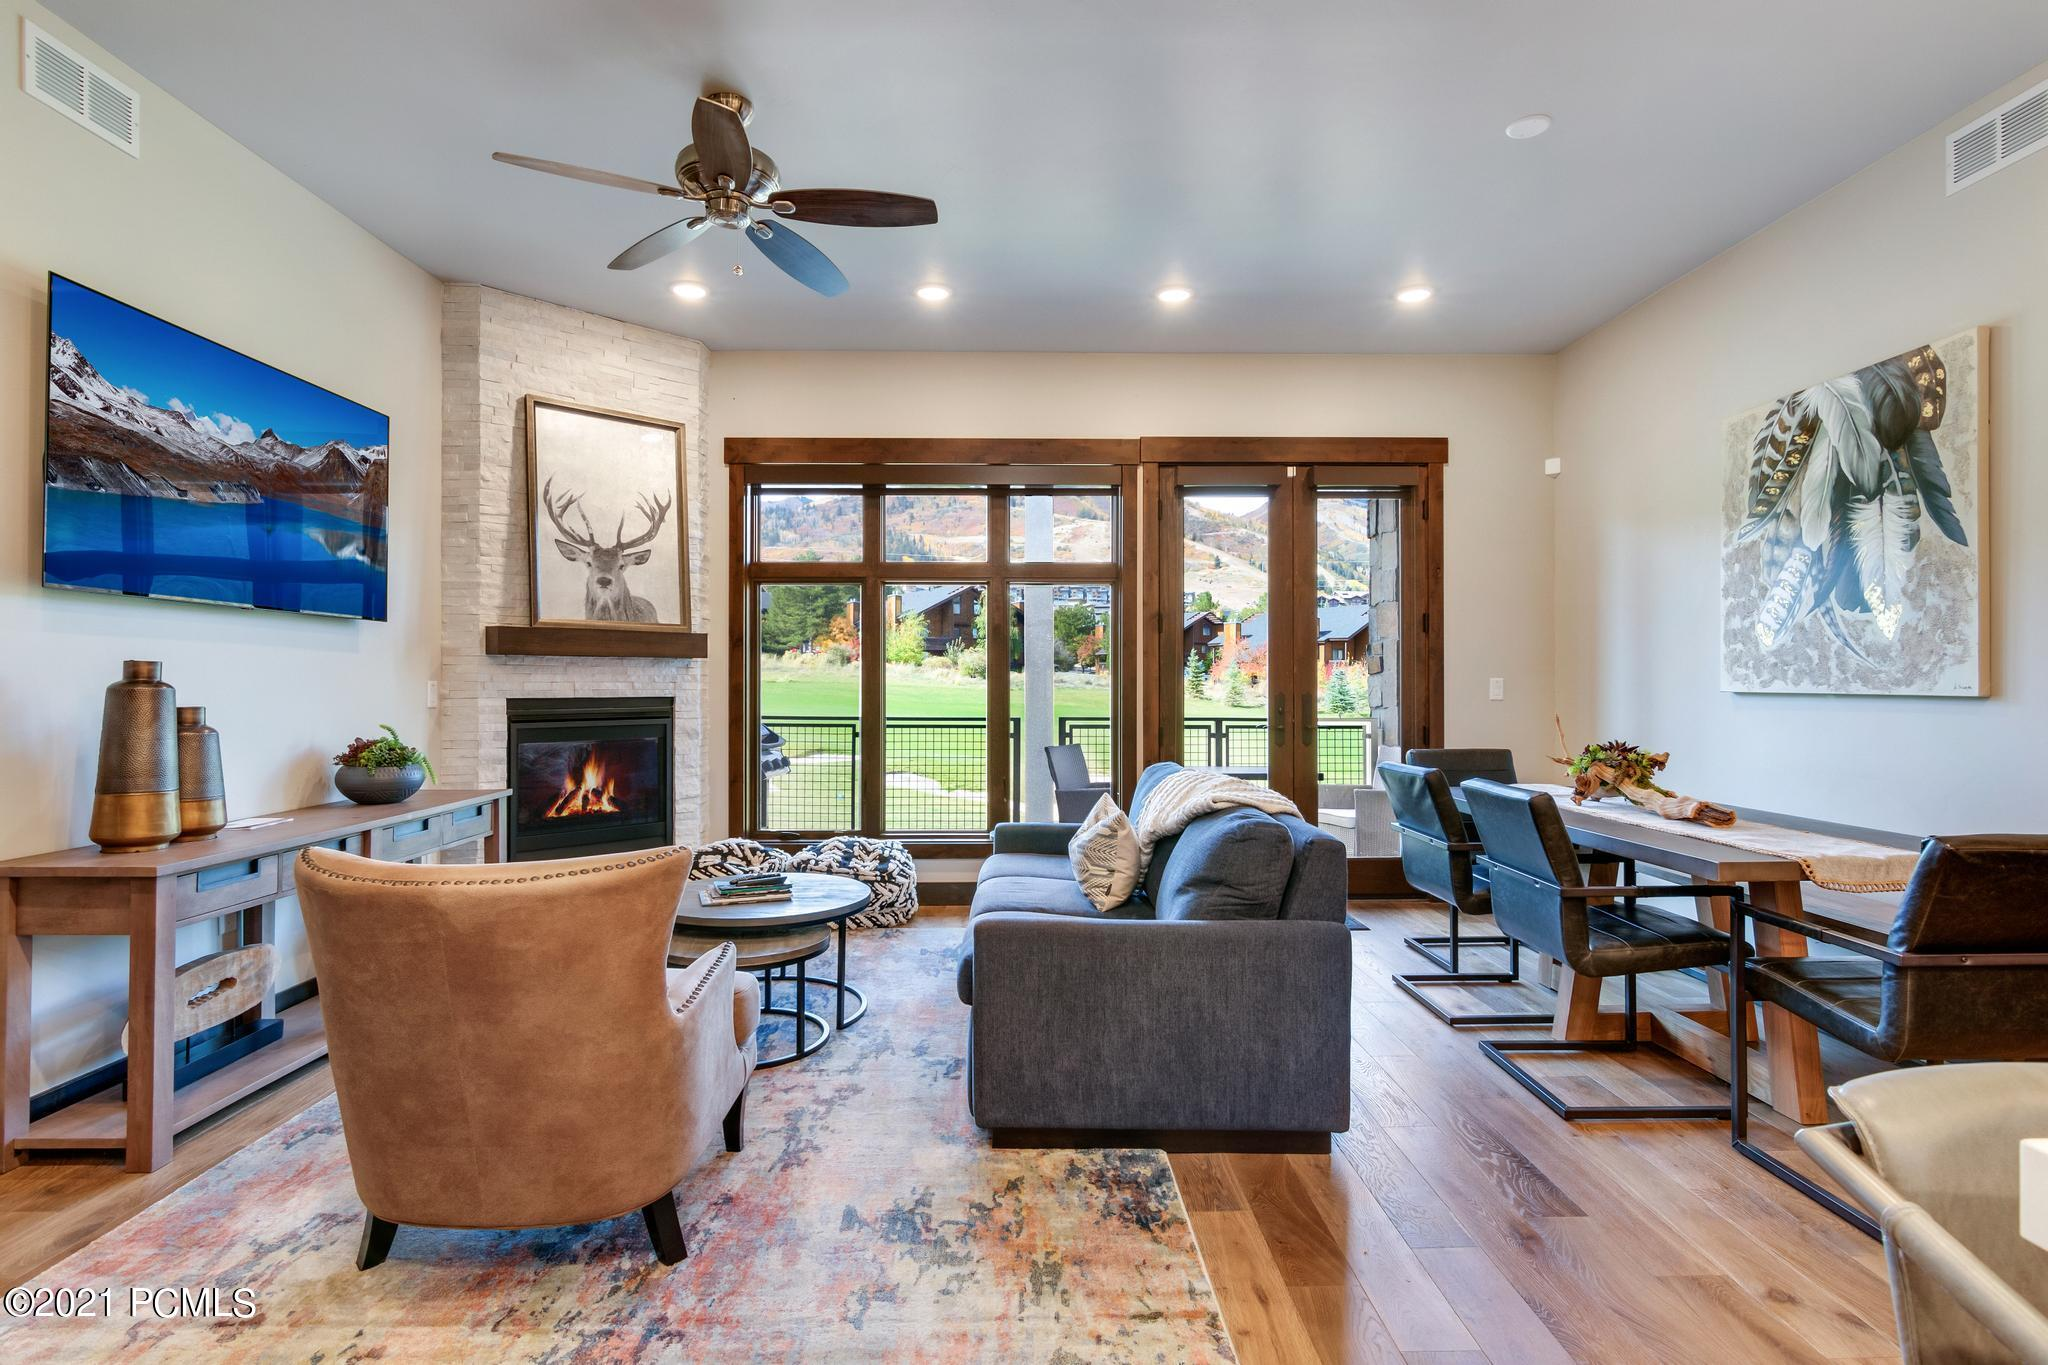 3751 Blackstone Dr, Park City, Utah 84098, 2 Bedrooms Bedrooms, ,3 BathroomsBathrooms,Condominium,For Sale,Blackstone Dr,12104143